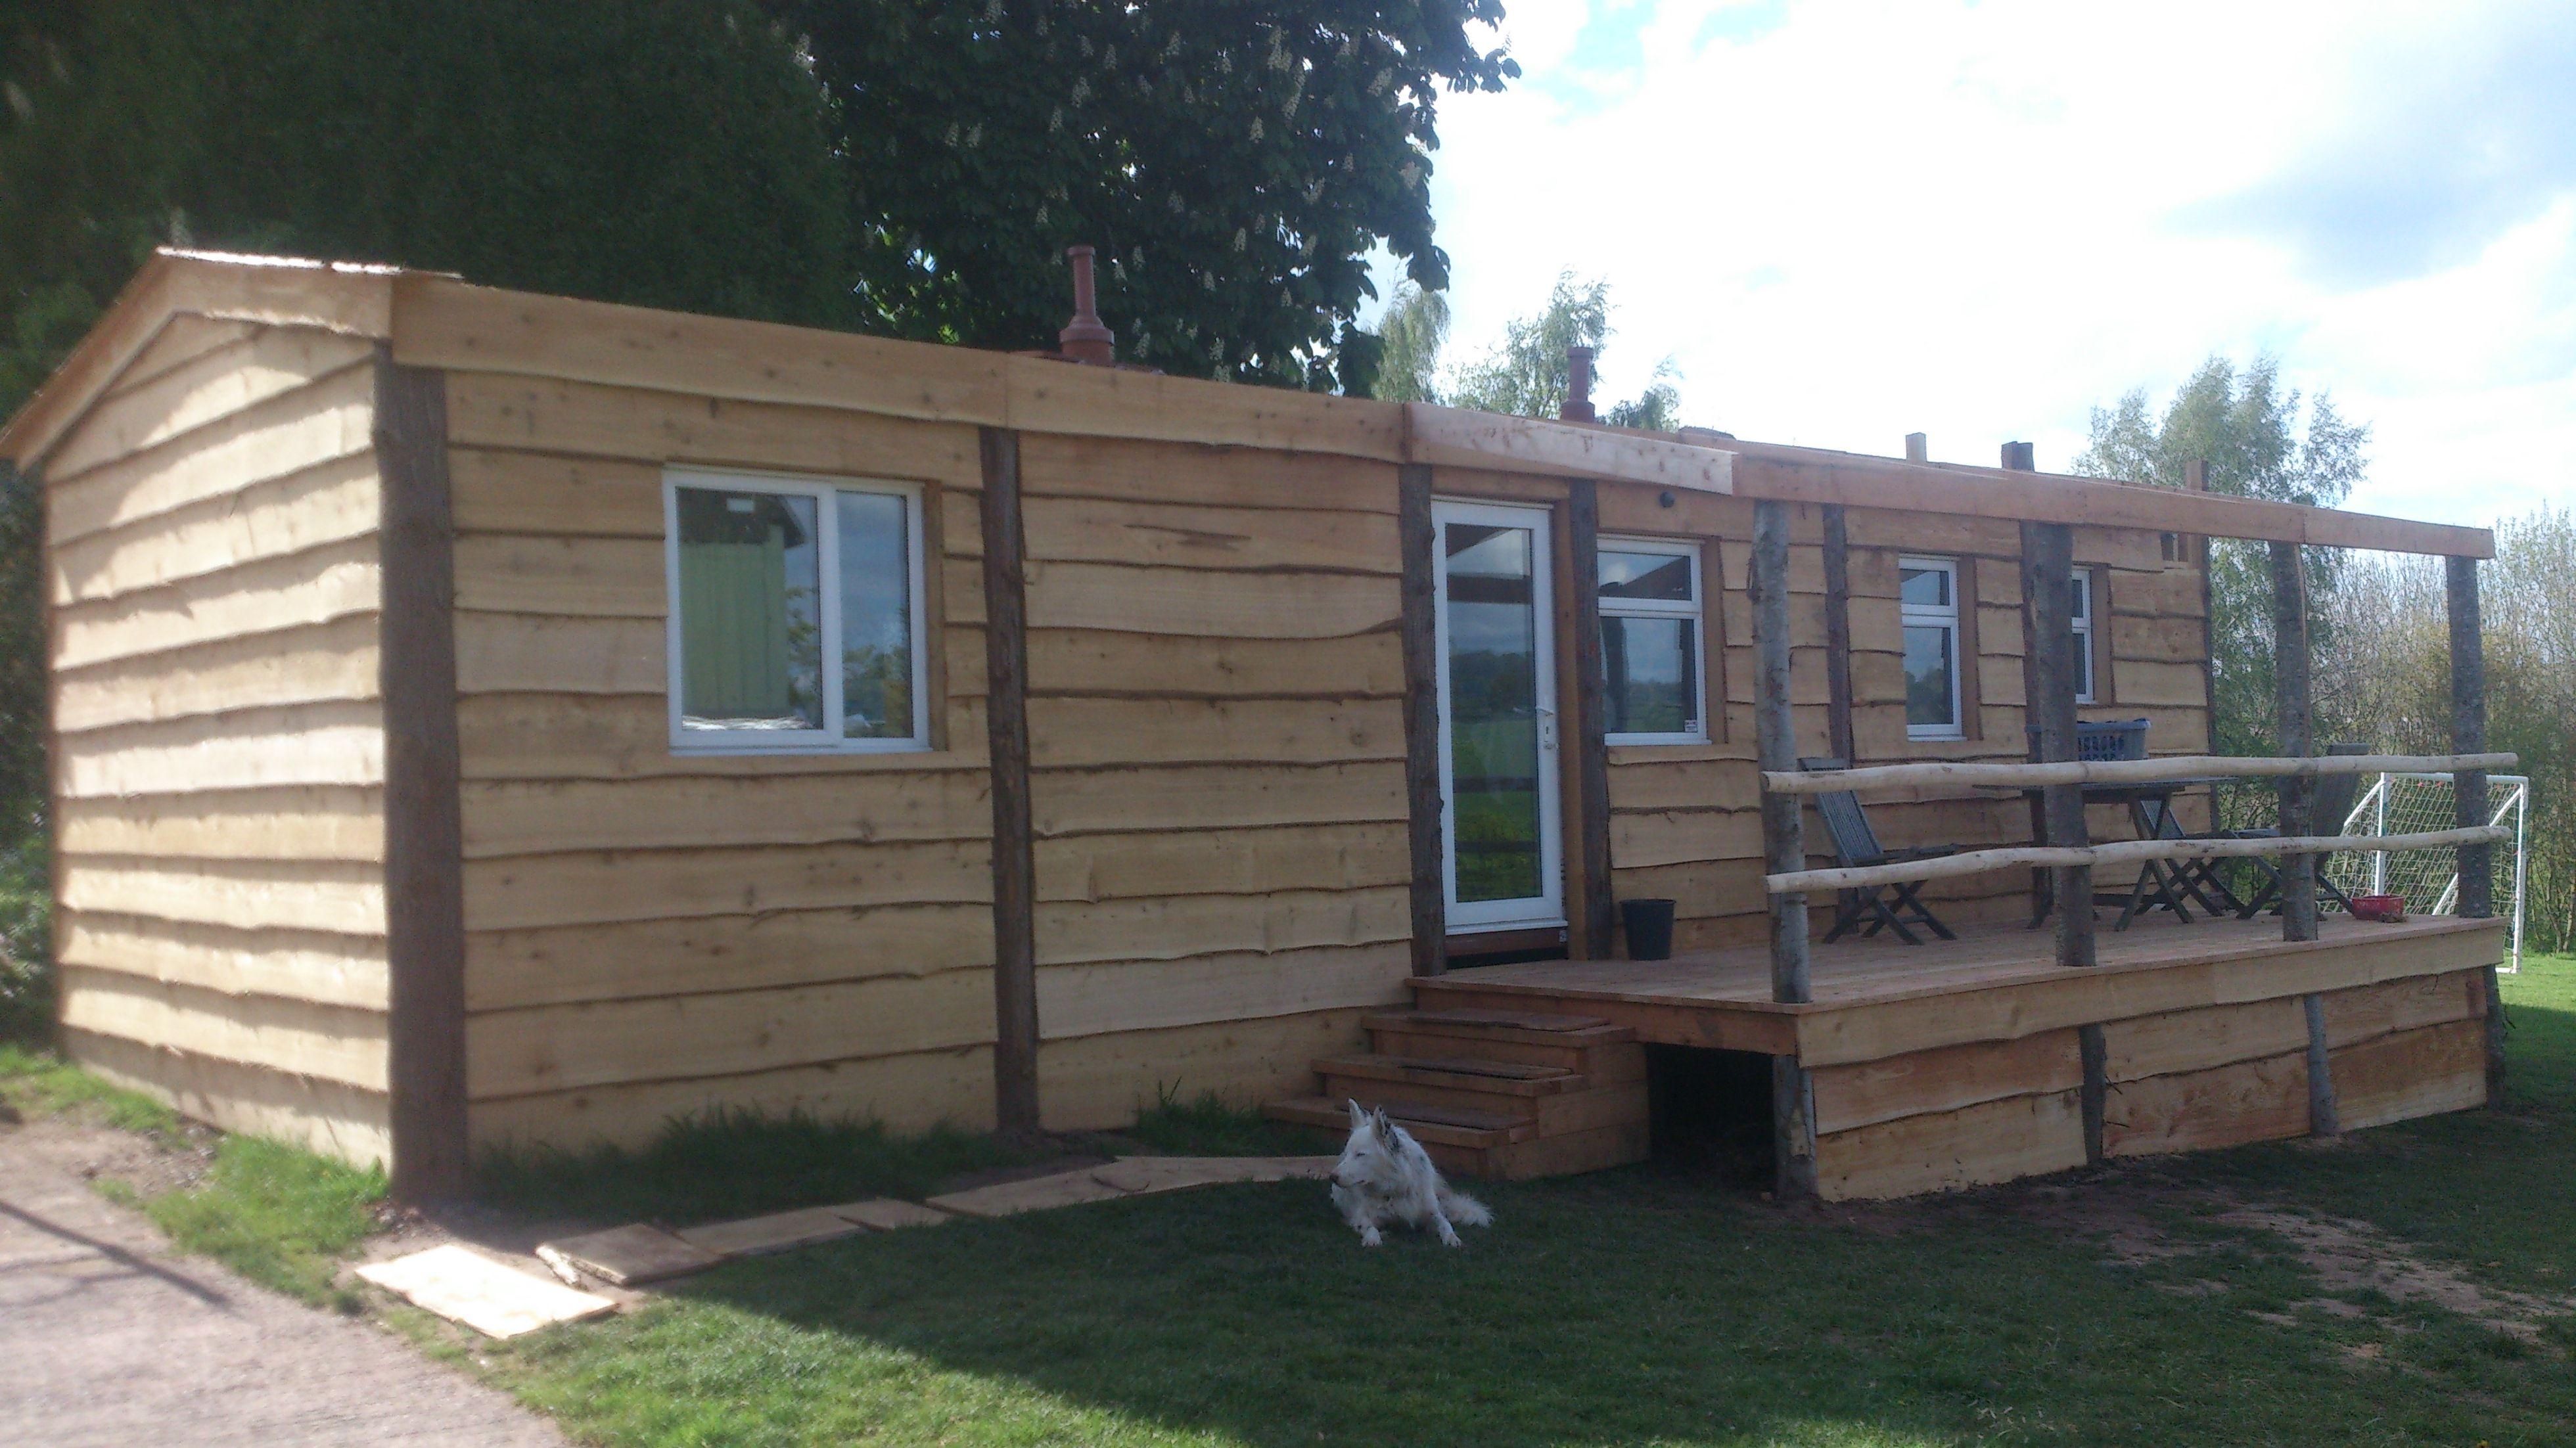 Caravan Cladded To Look Like A Log Cabin My Caravan Pinterest Log Cabins Cabin And Logs